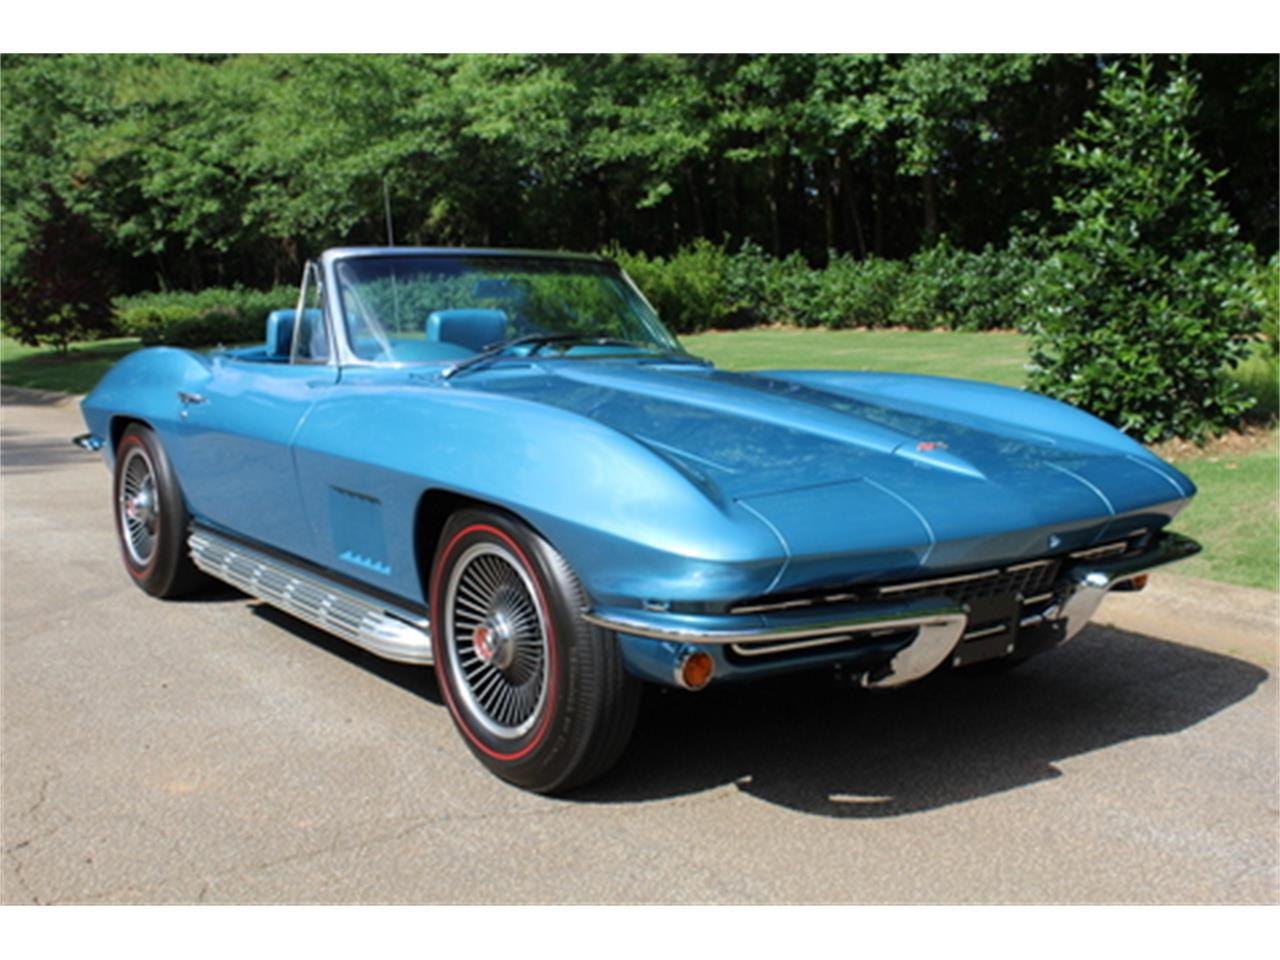 Large Picture of Classic 1967 Corvette - $110,000.00 - Q5DT